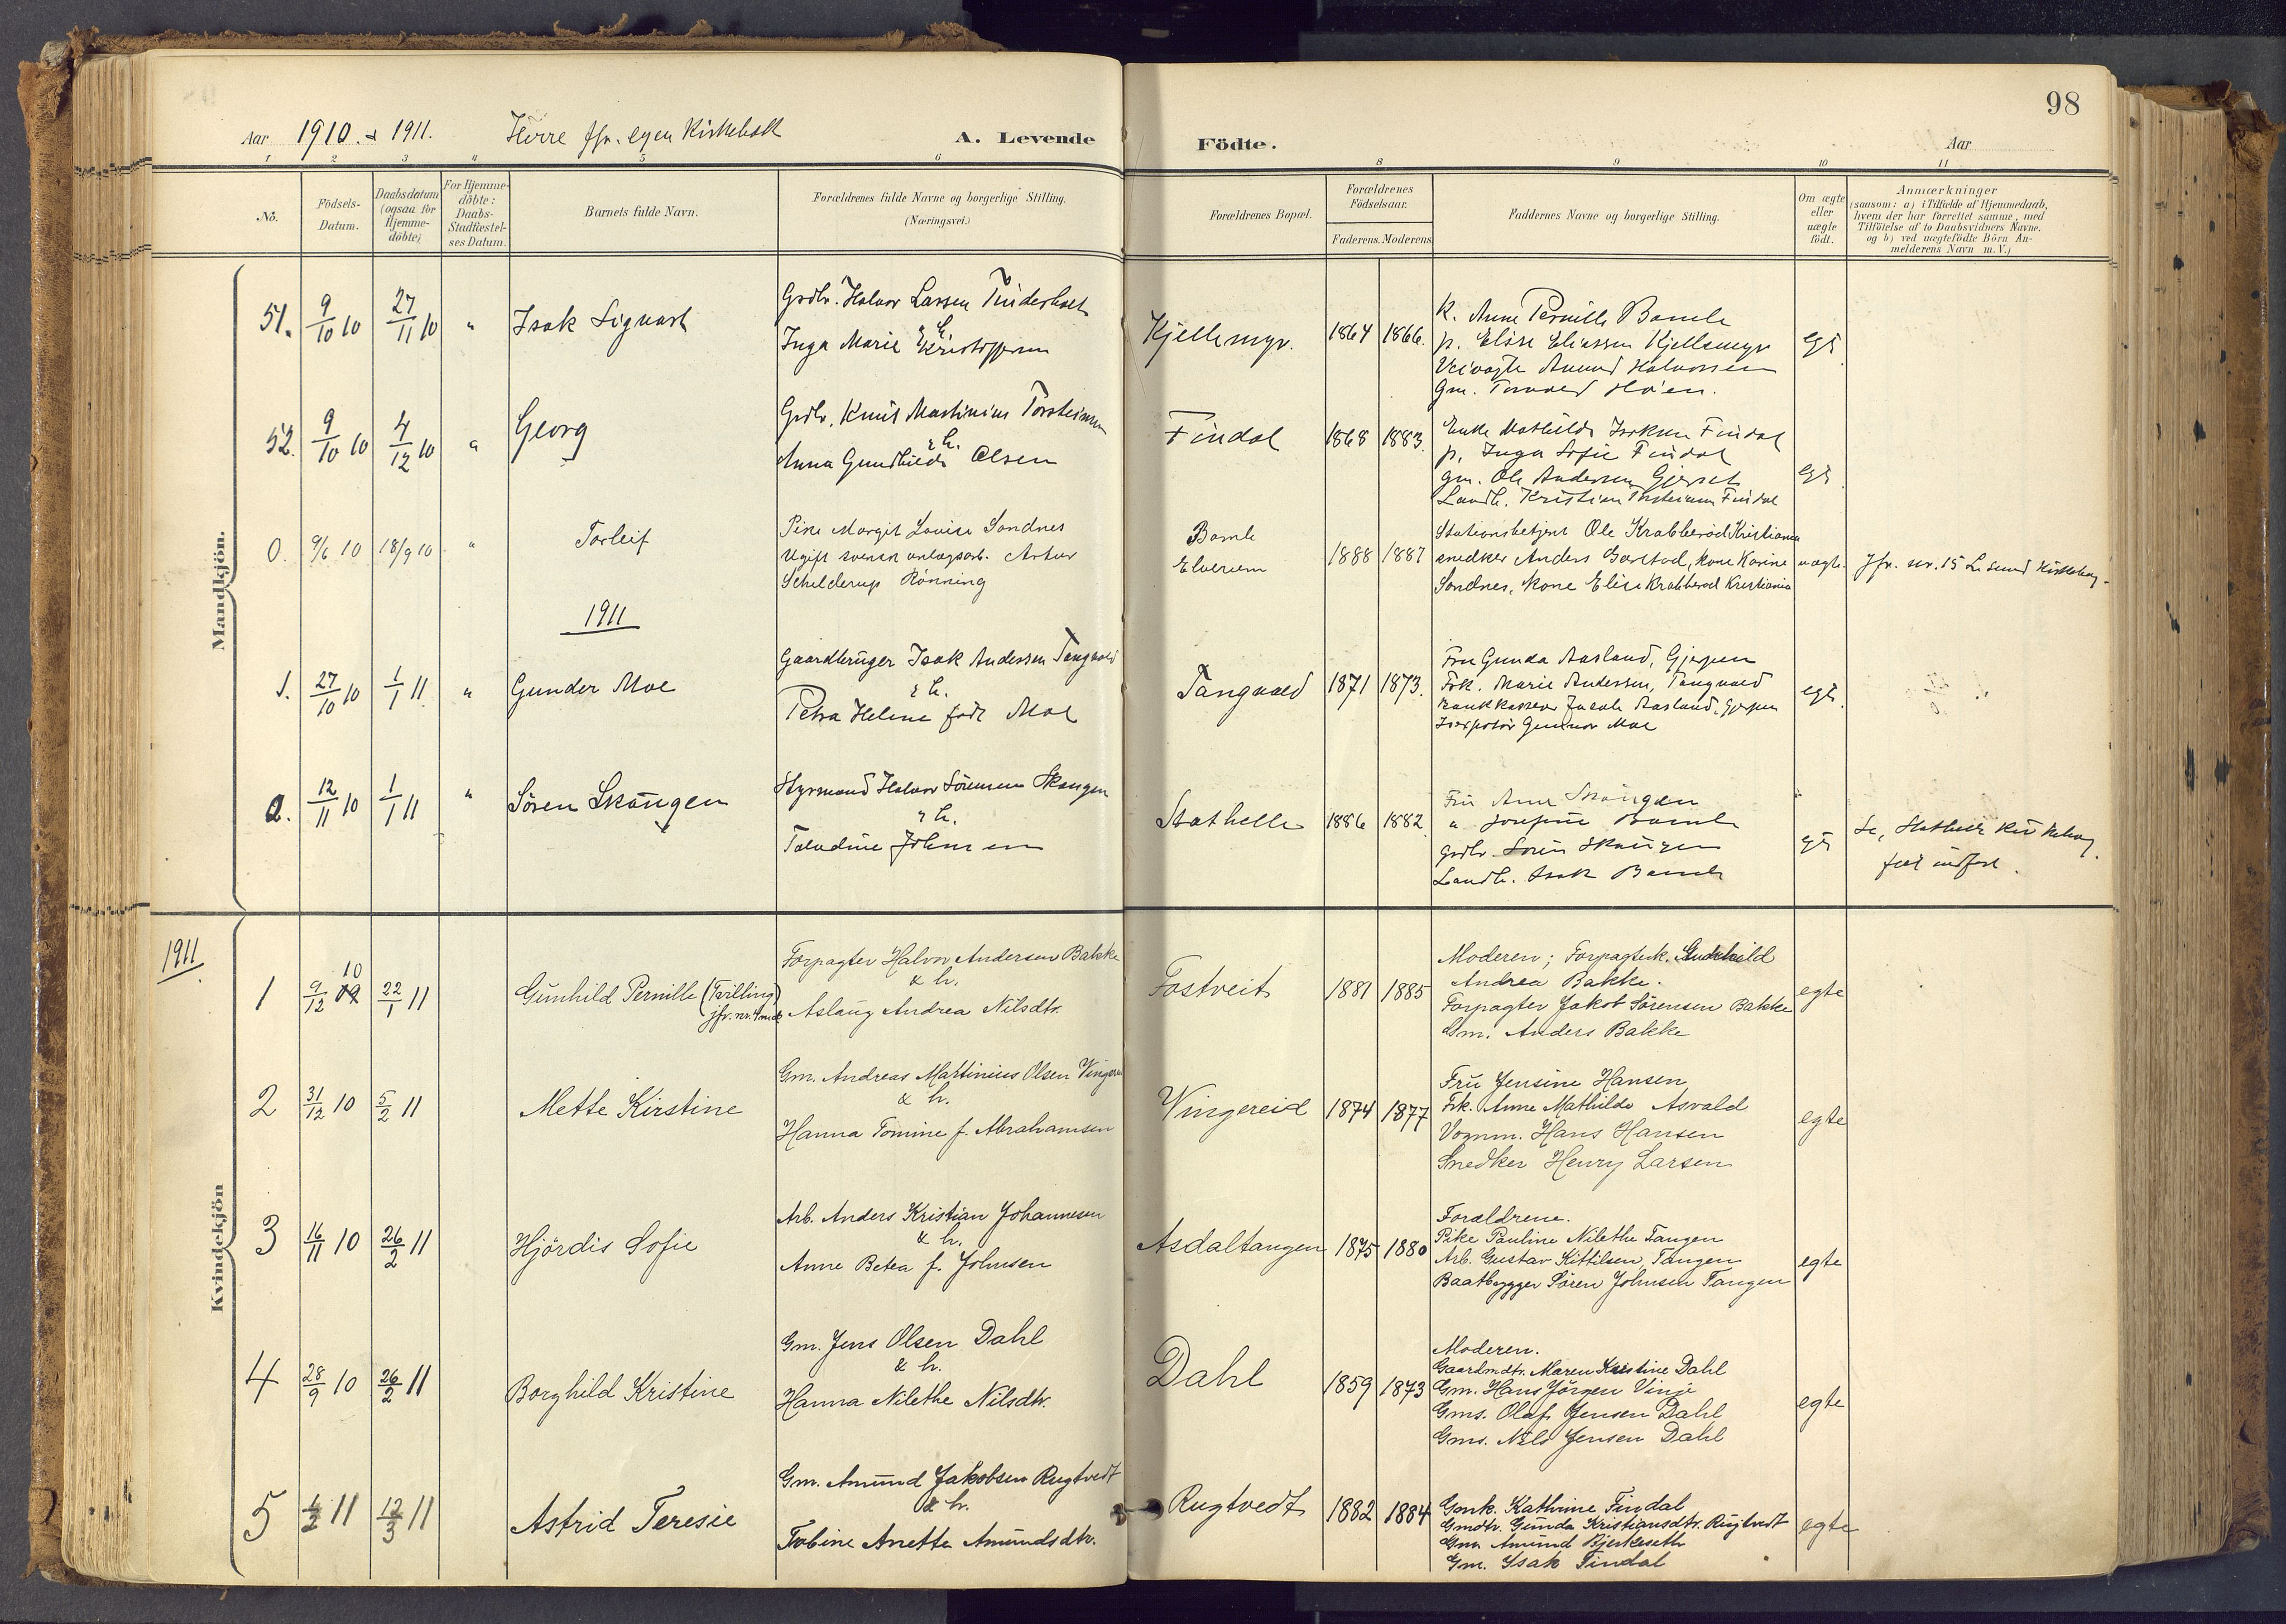 SAKO, Bamble kirkebøker, F/Fa/L0009: Ministerialbok nr. I 9, 1901-1917, s. 98